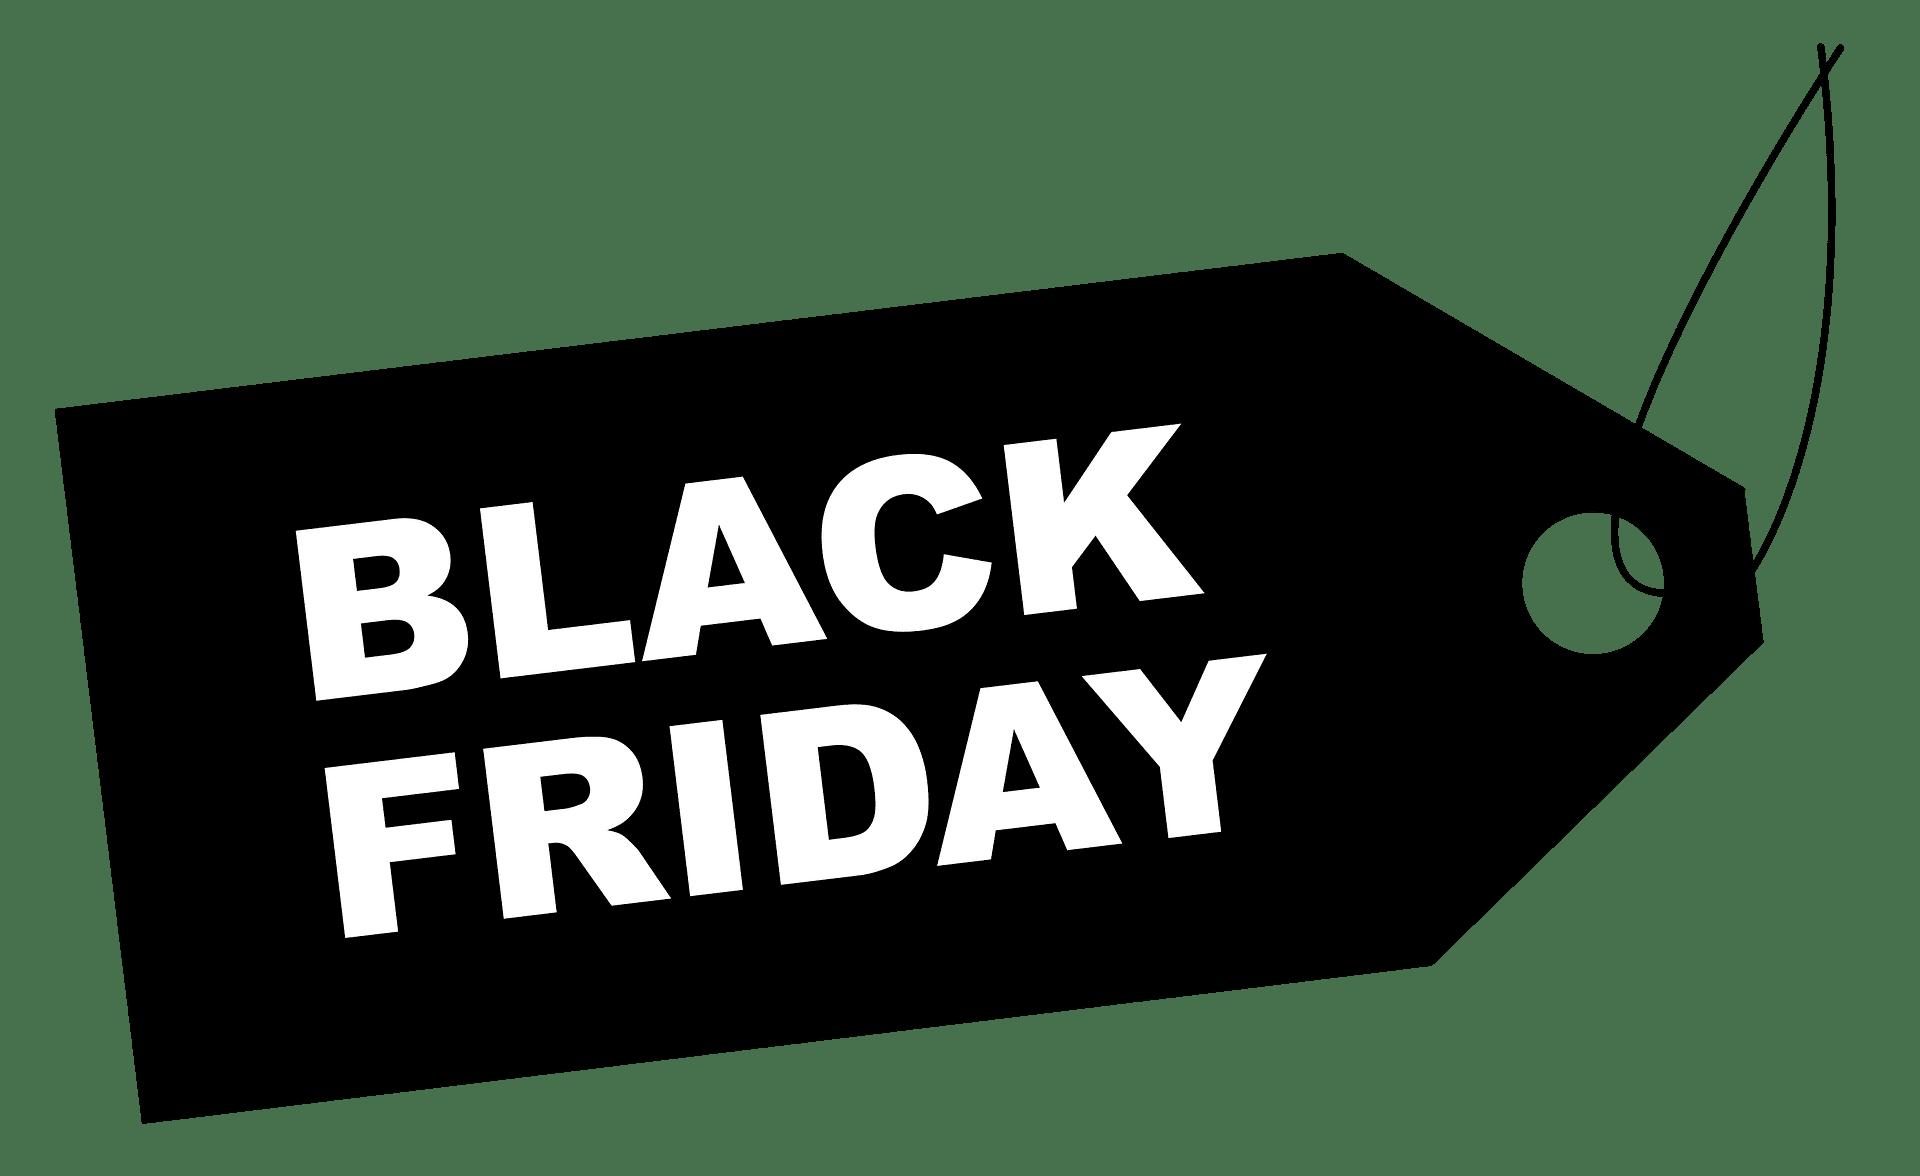 black-friday-2894130_1920